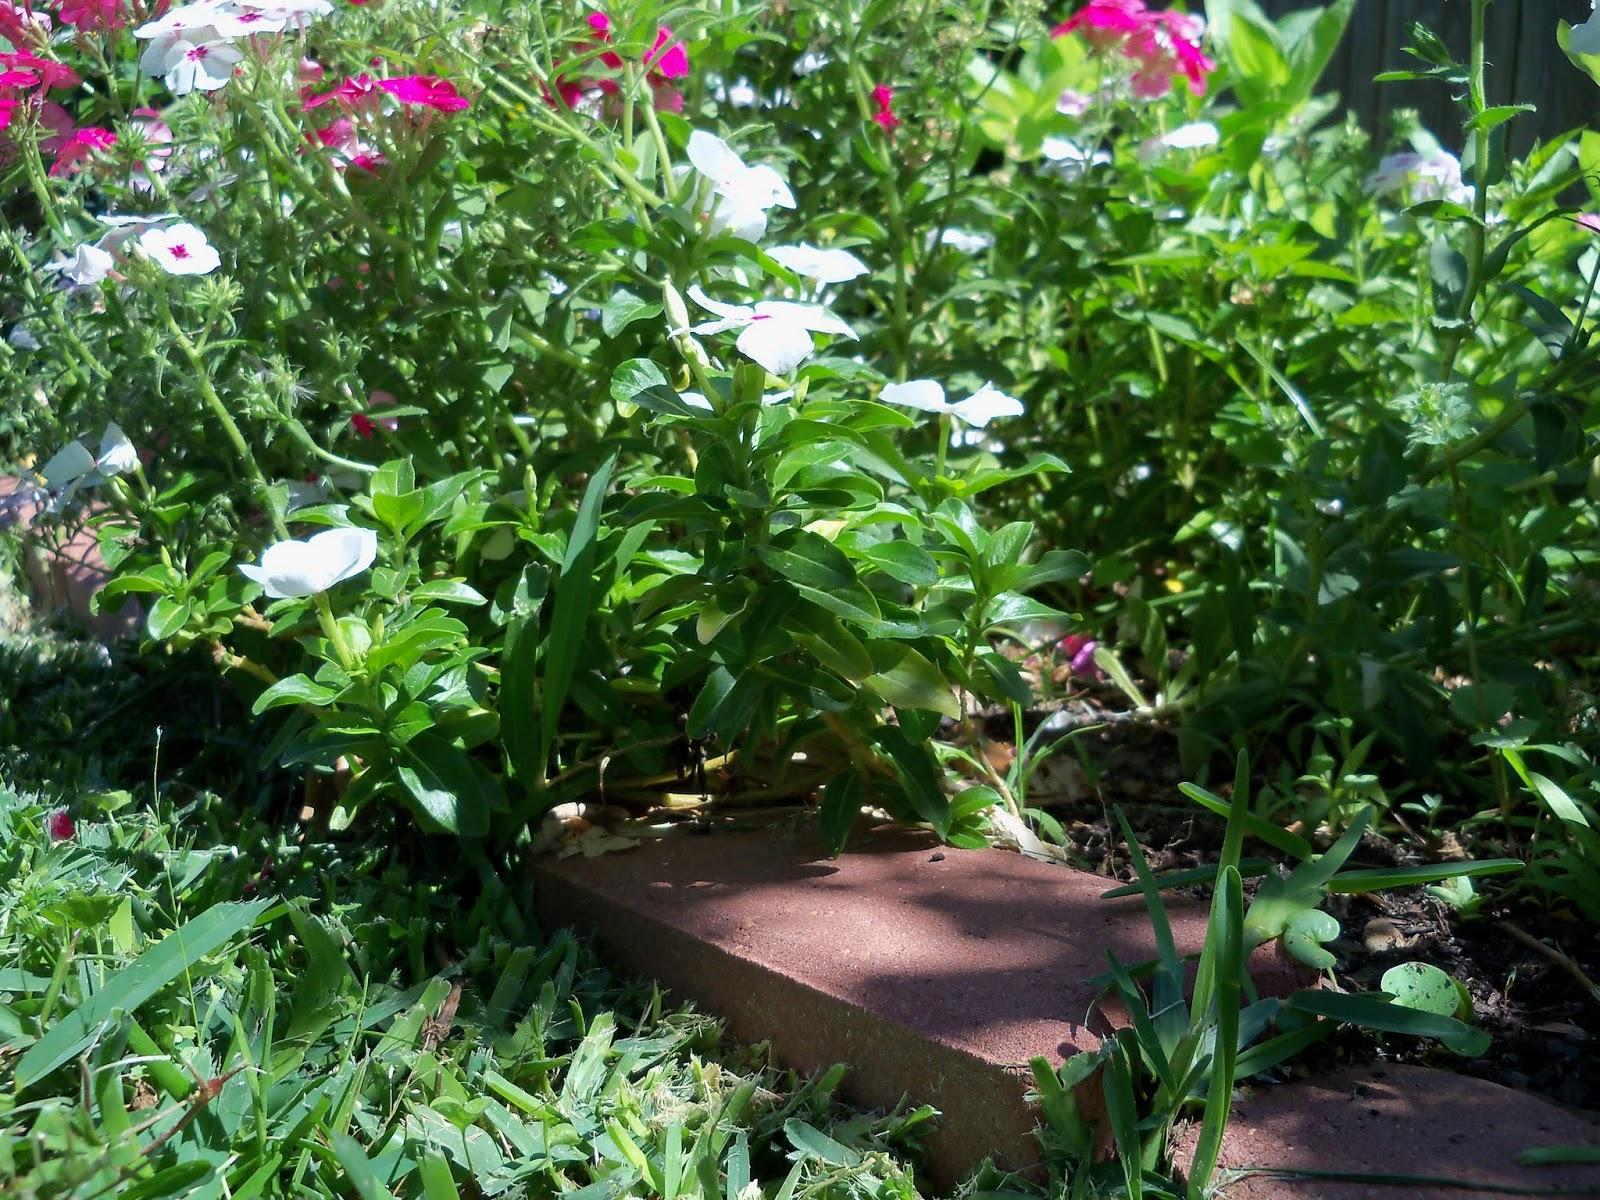 Gardening 2013 - 115_6258.JPG